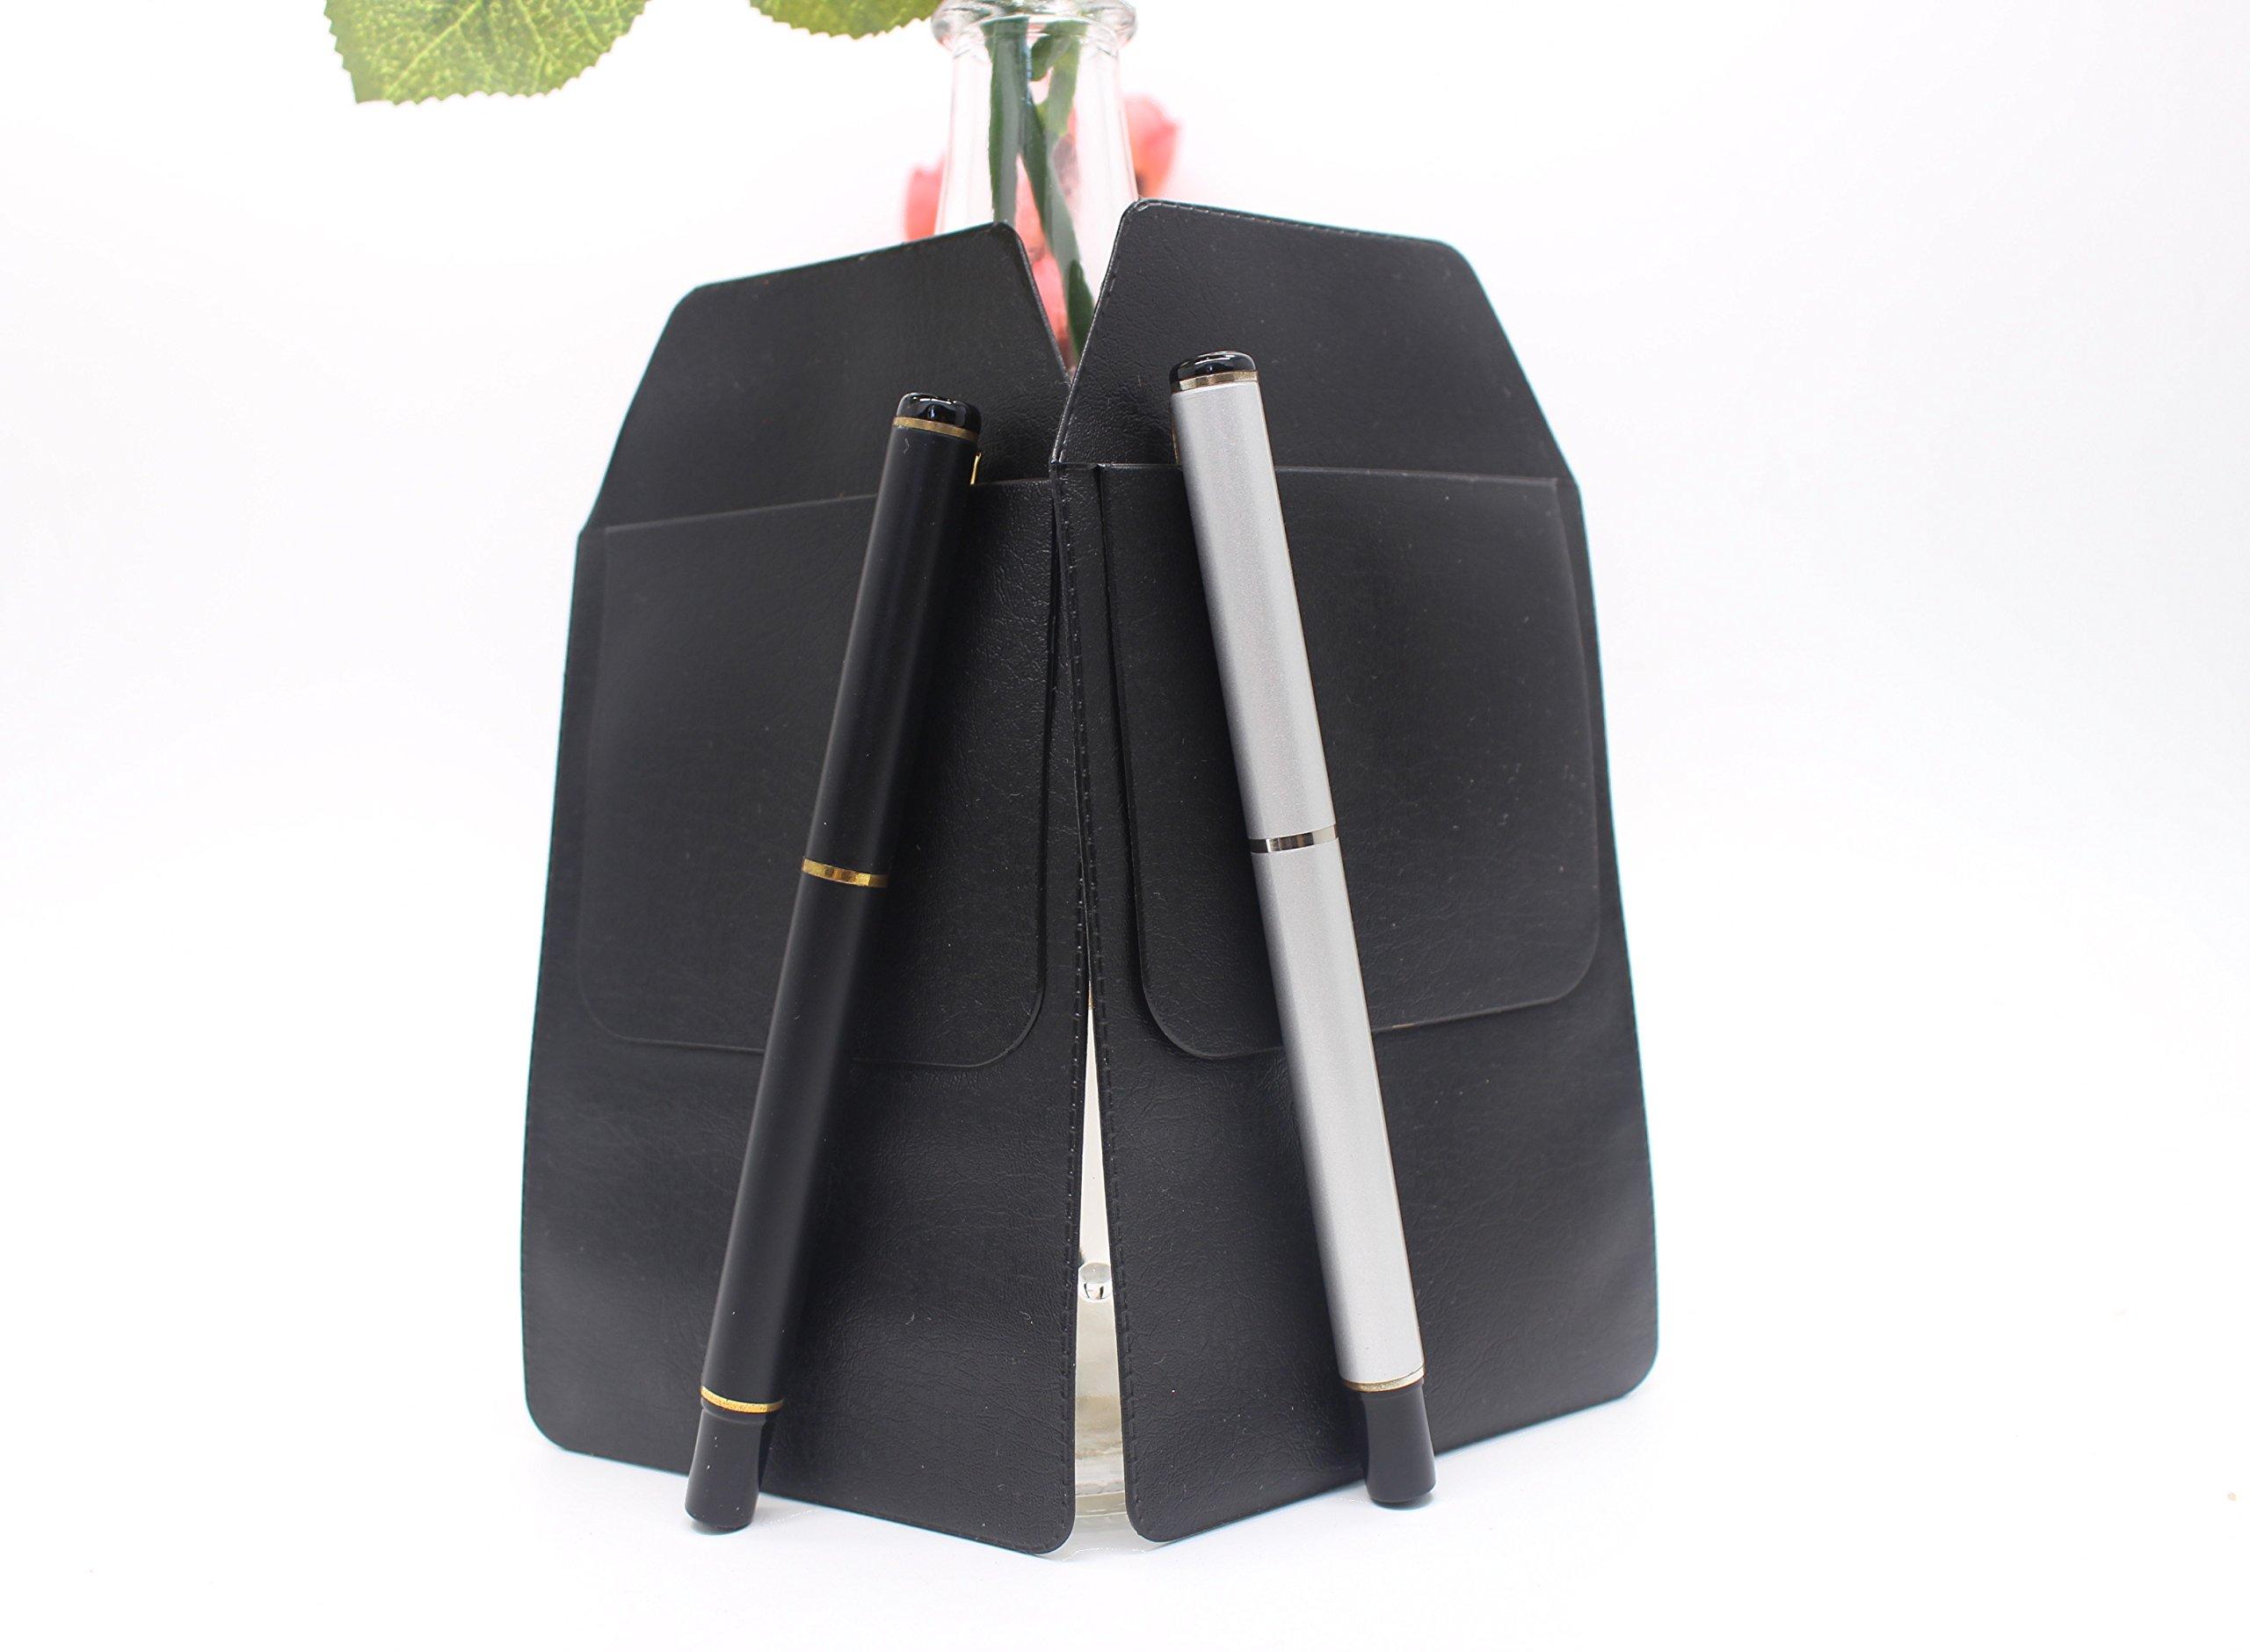 6 Pcs Black Vinyl Pocket Protector, for Pen Leaks,for School Hospital Office by Alago (Image #3)